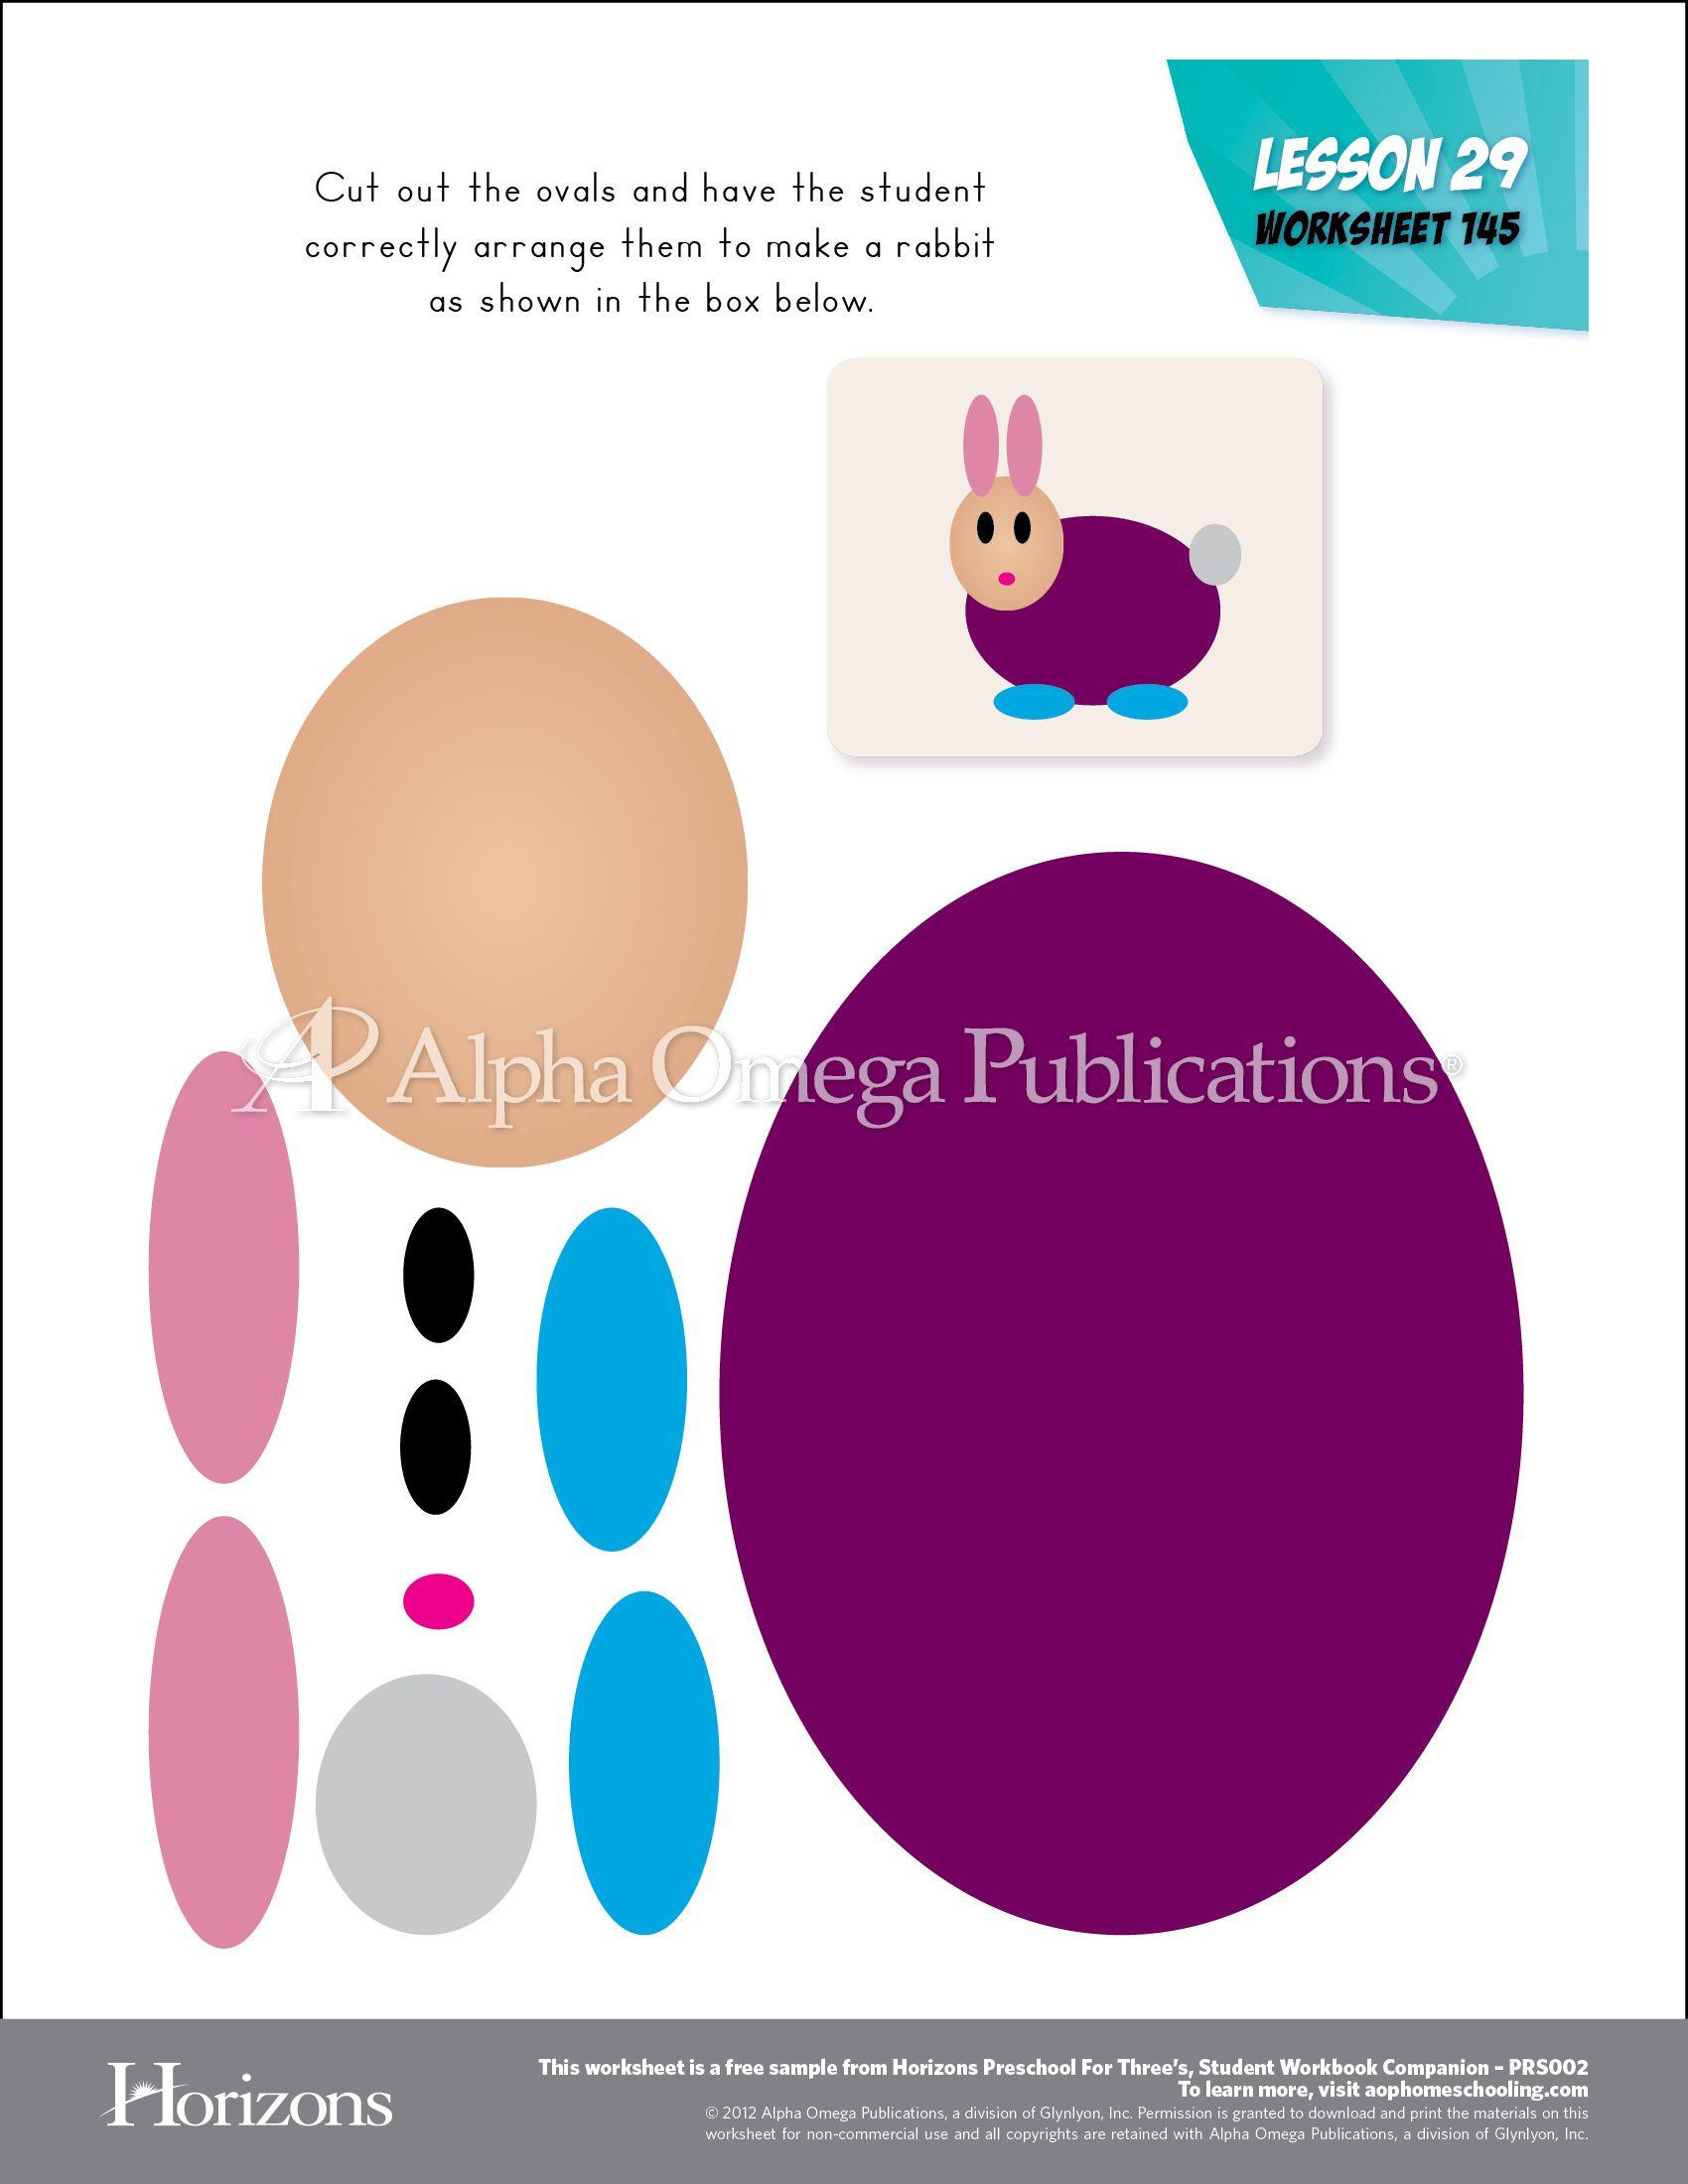 Horizons Preschool For Three S Sample Worksheet Curriculum